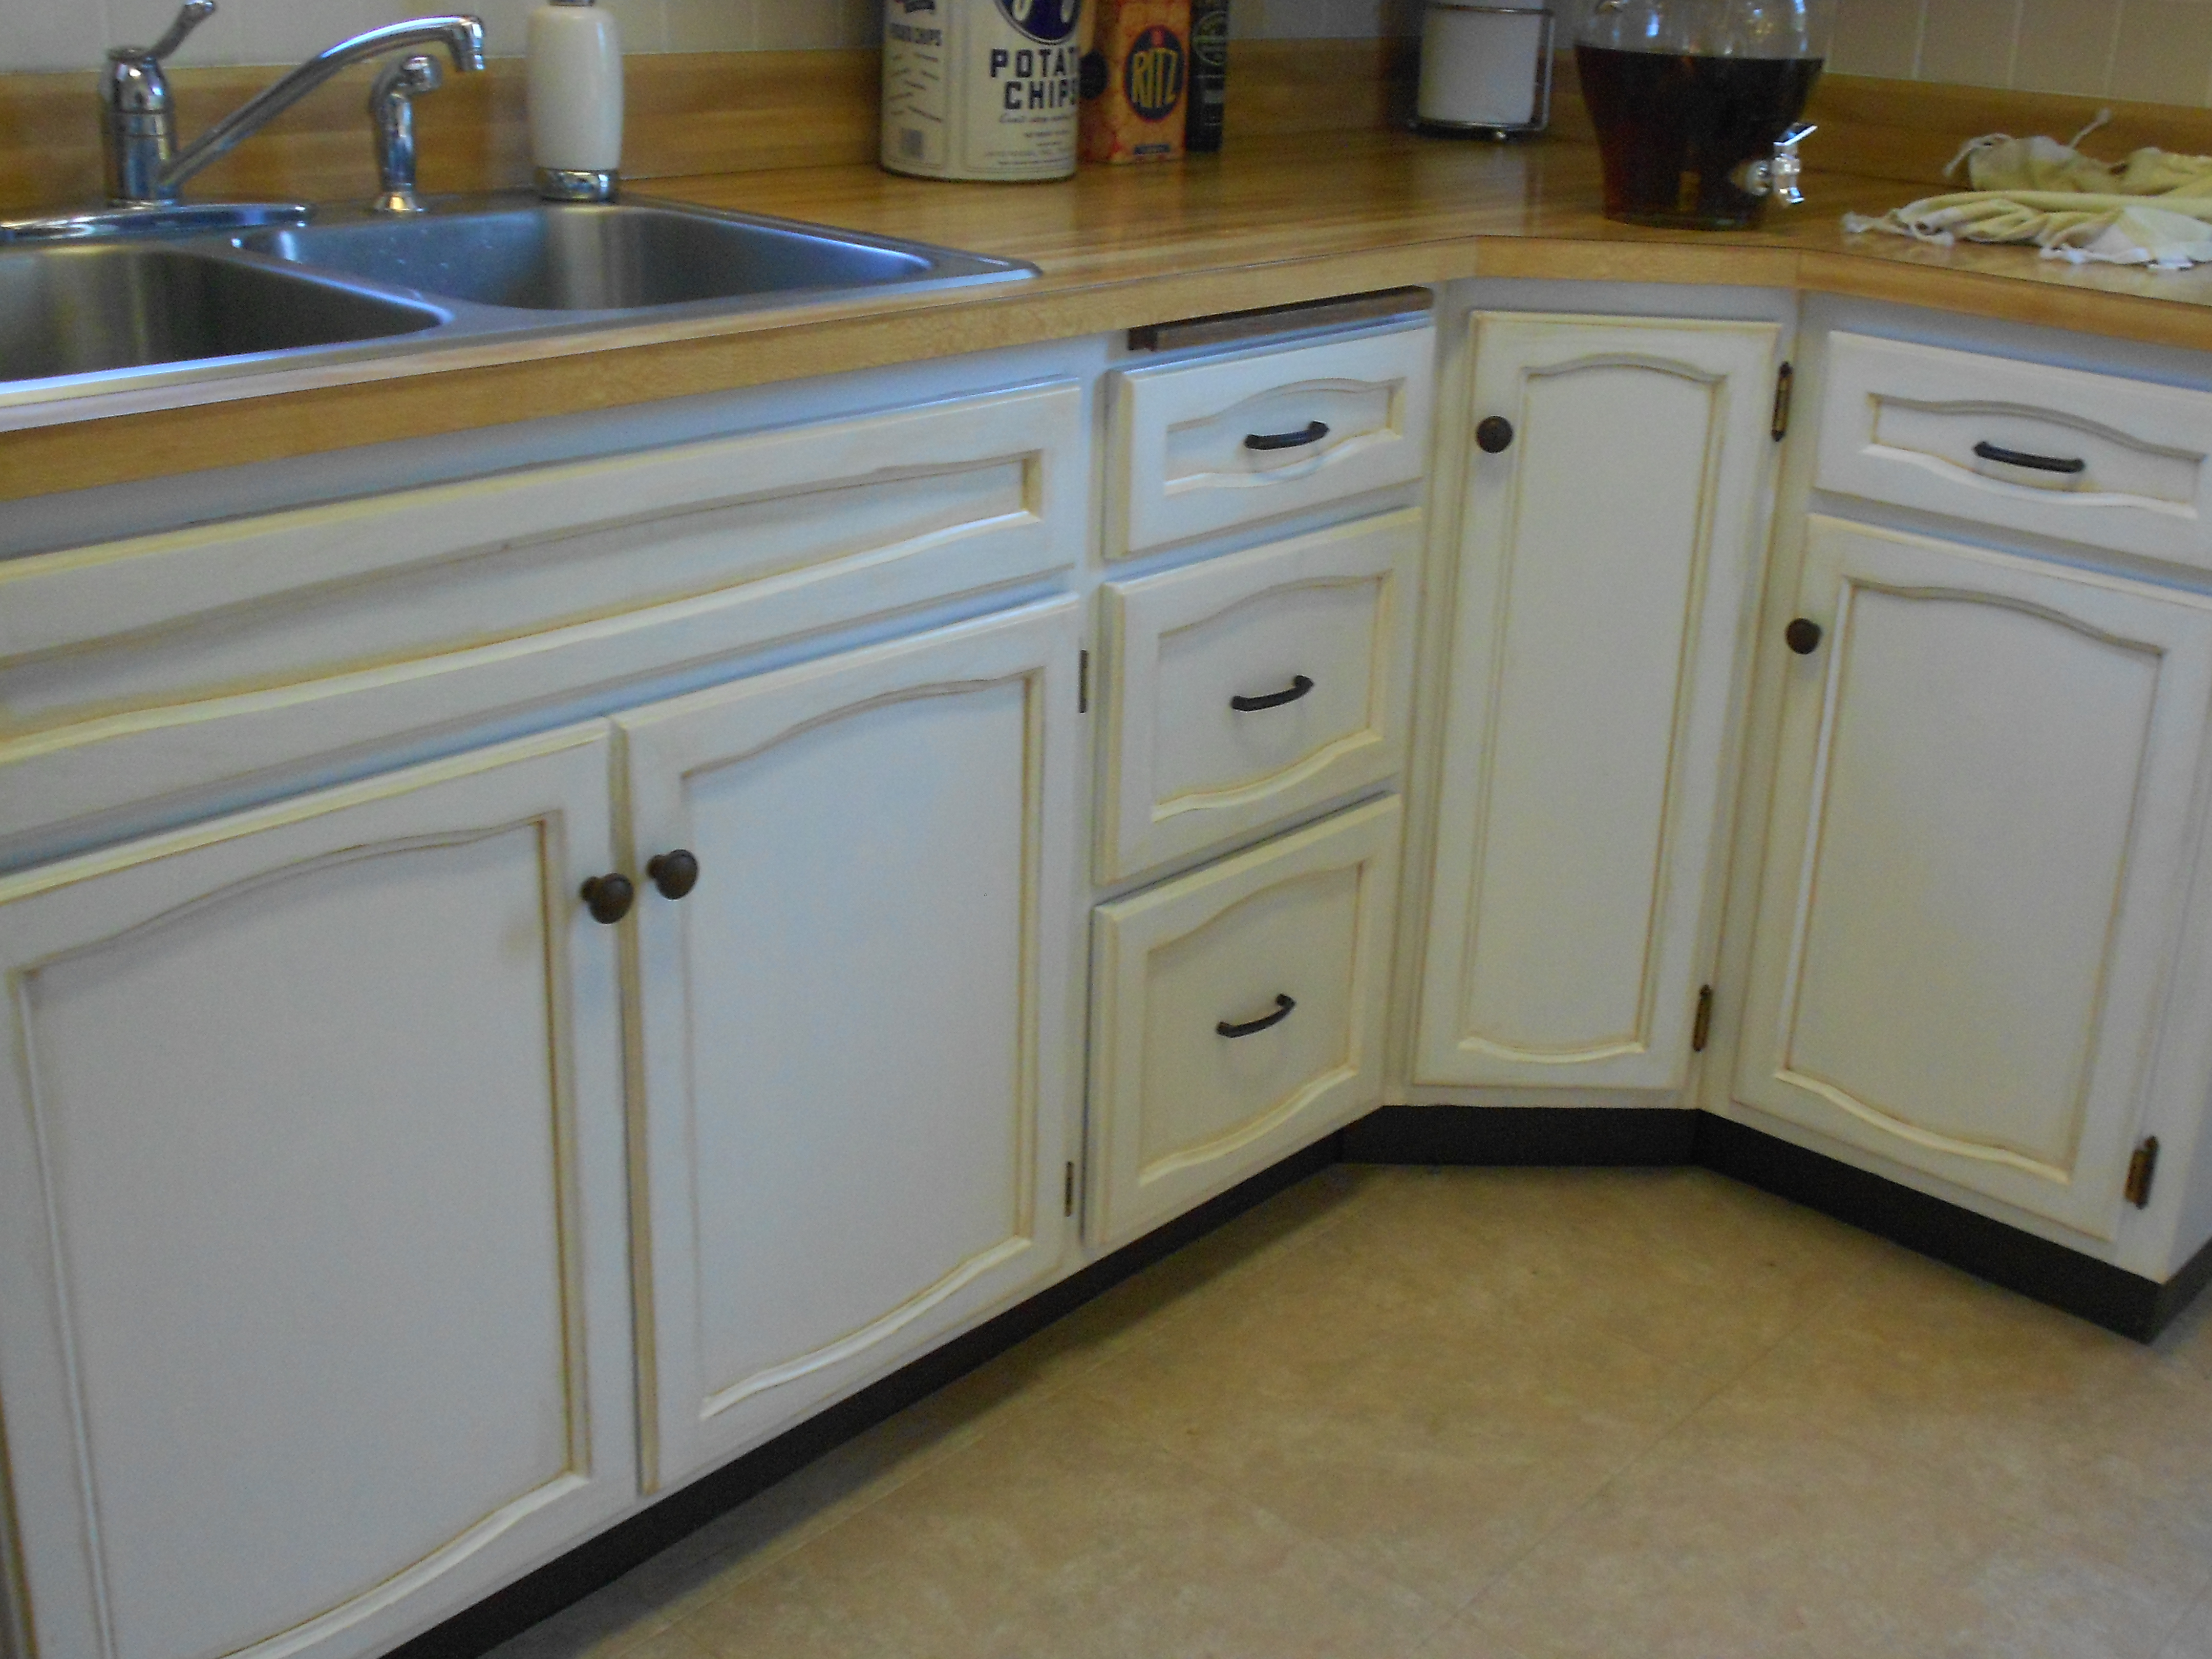 Rustoleum cabinet transformations seaside - Rustoleum Cabinet Transformations Pure White